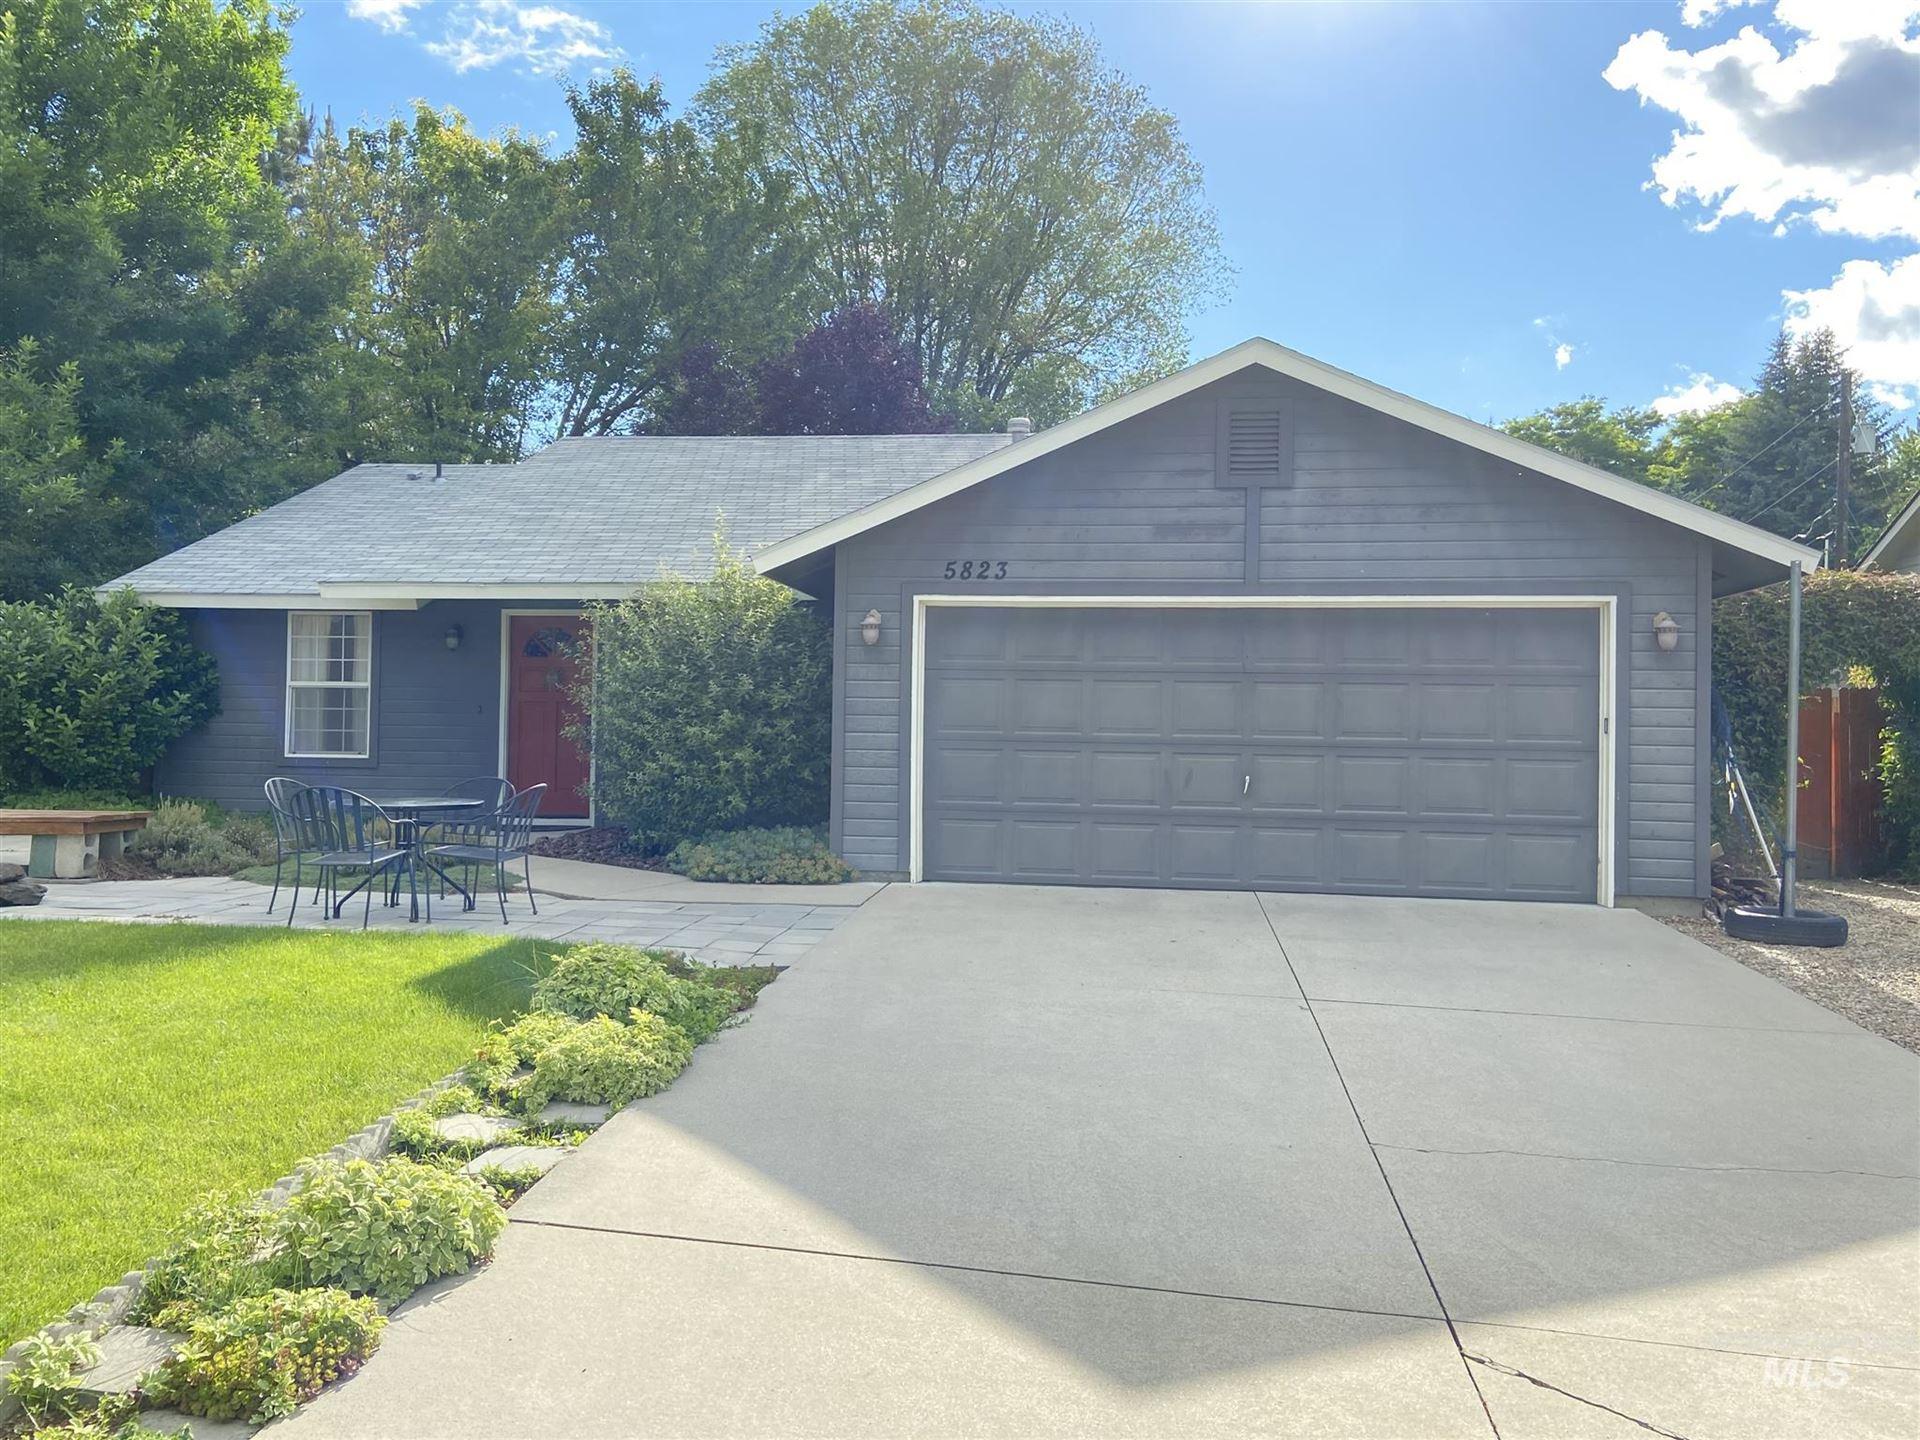 5823 N Glenborough Place, Boise, ID 83714 - MLS#: 98771090